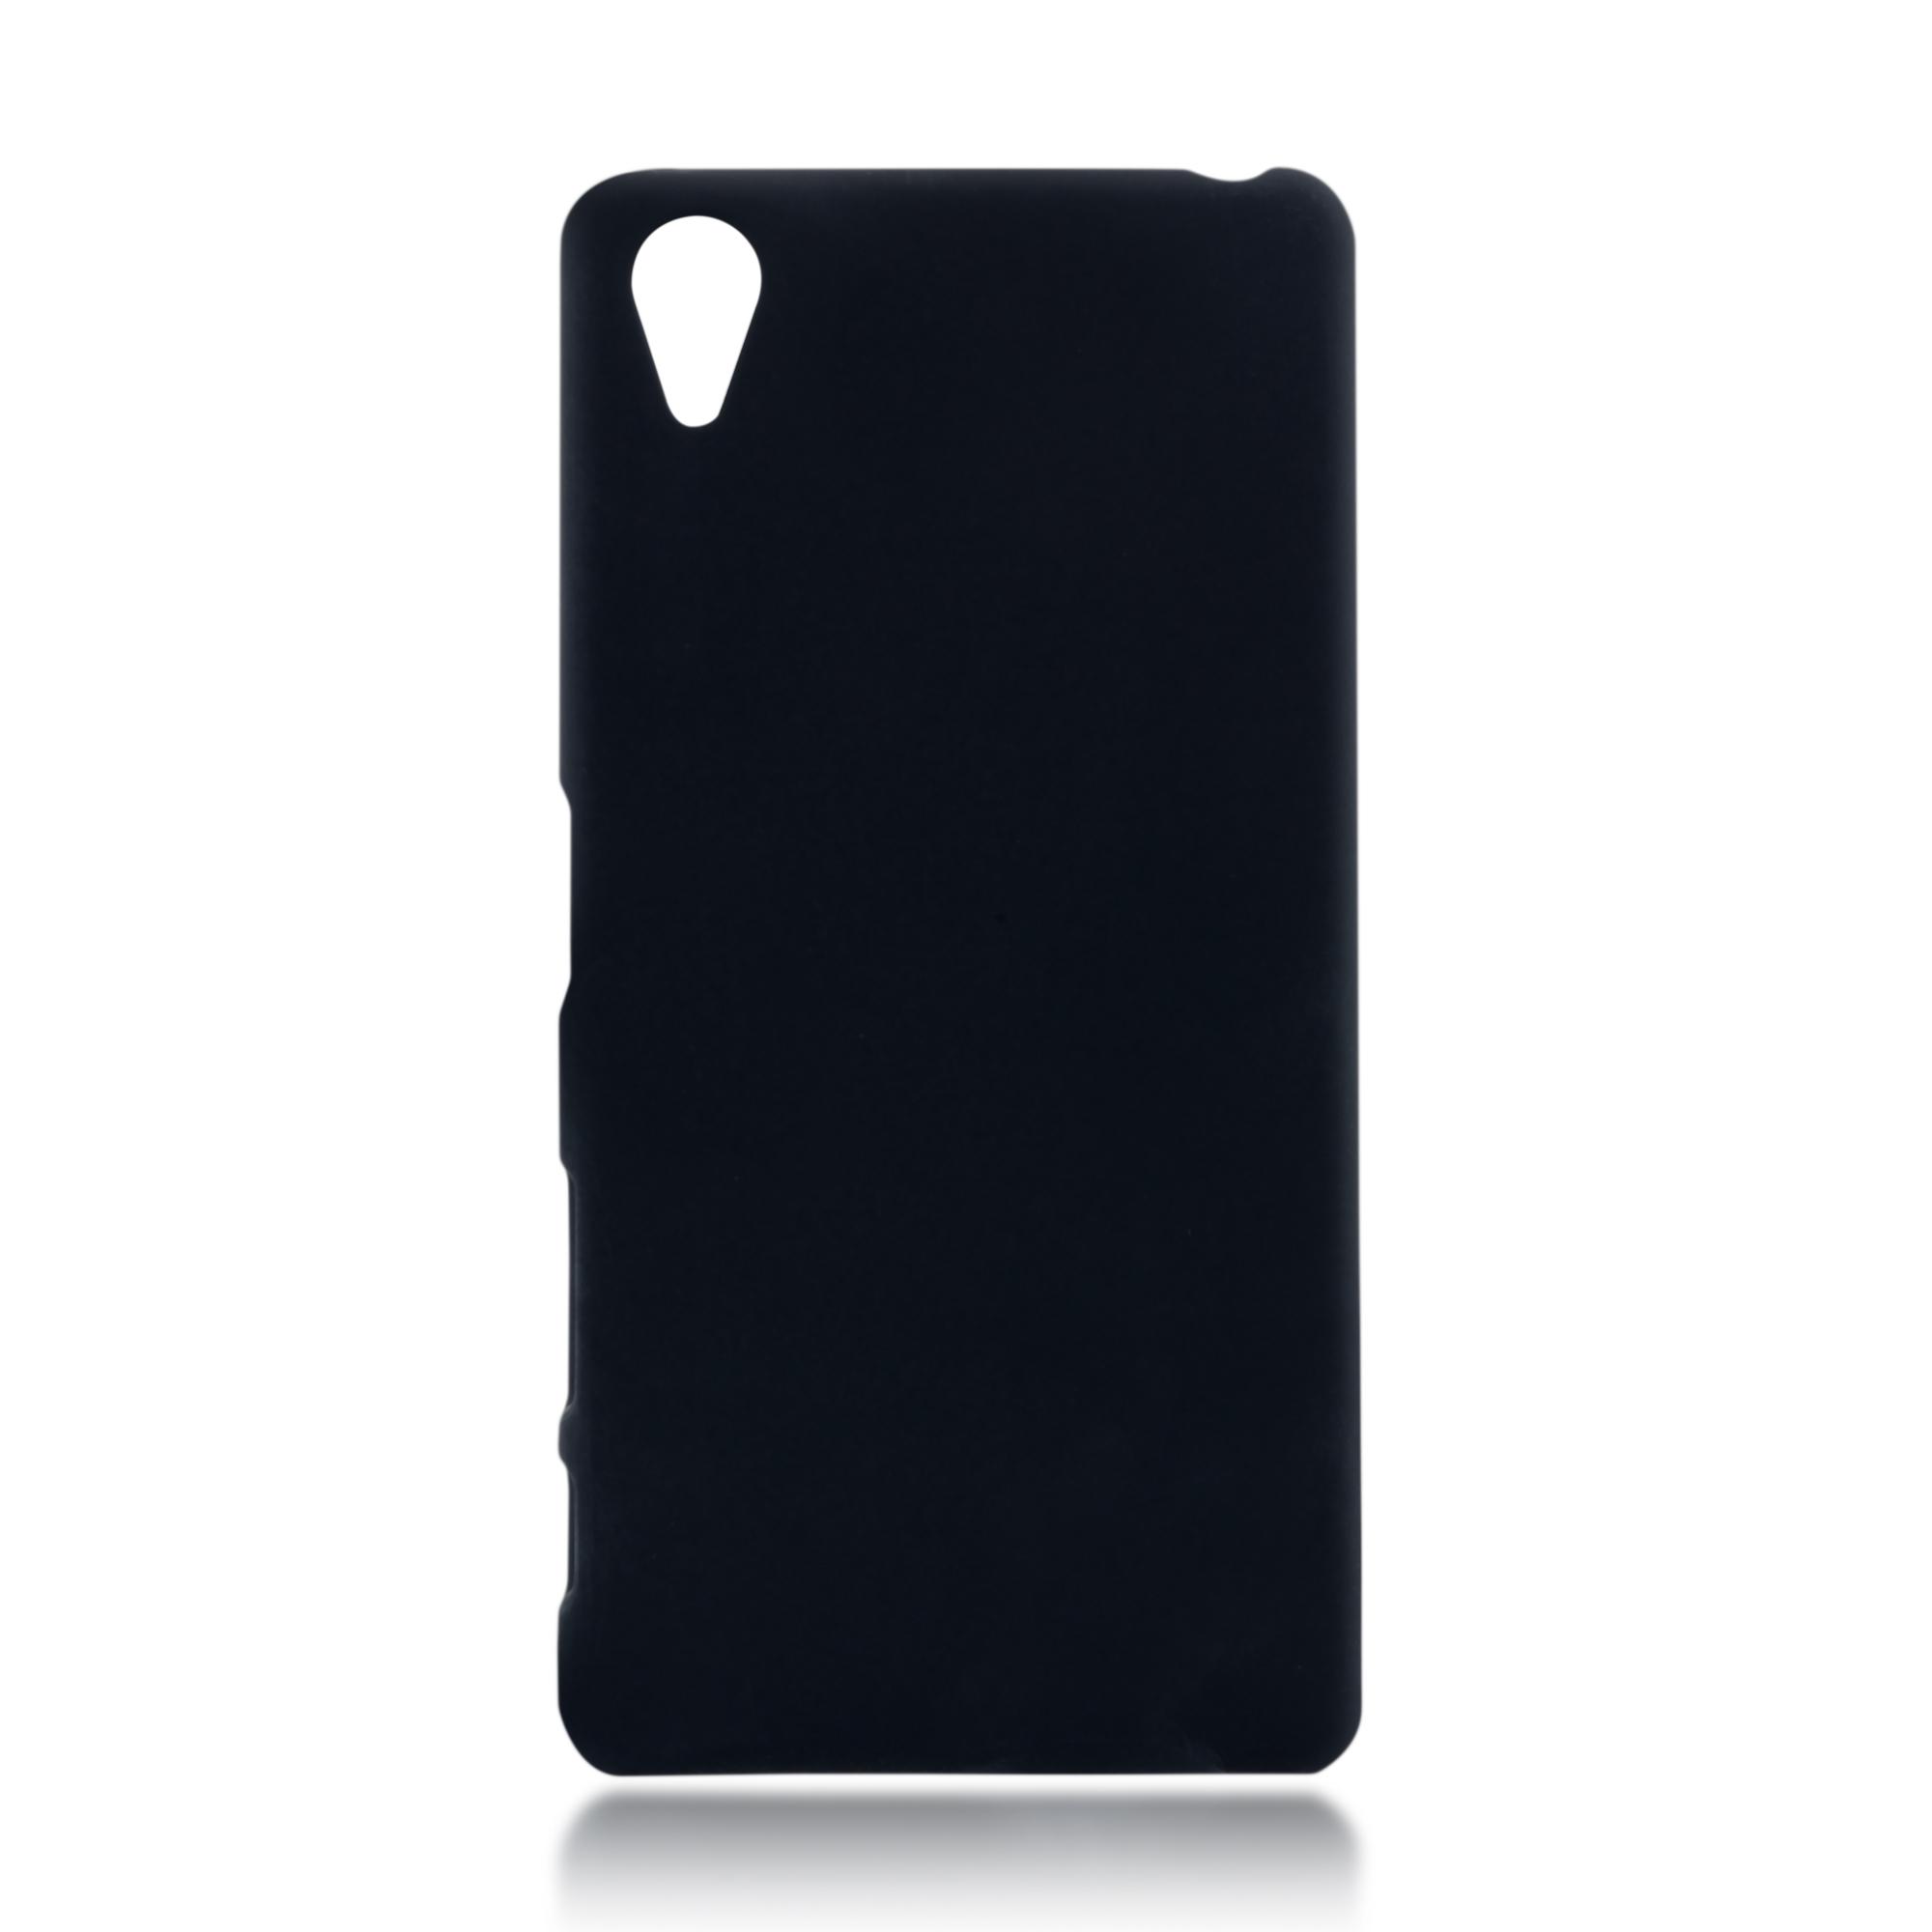 Пластиковая накладка Brosco Soft-touch для Sony Xperia X Perfomance, черная